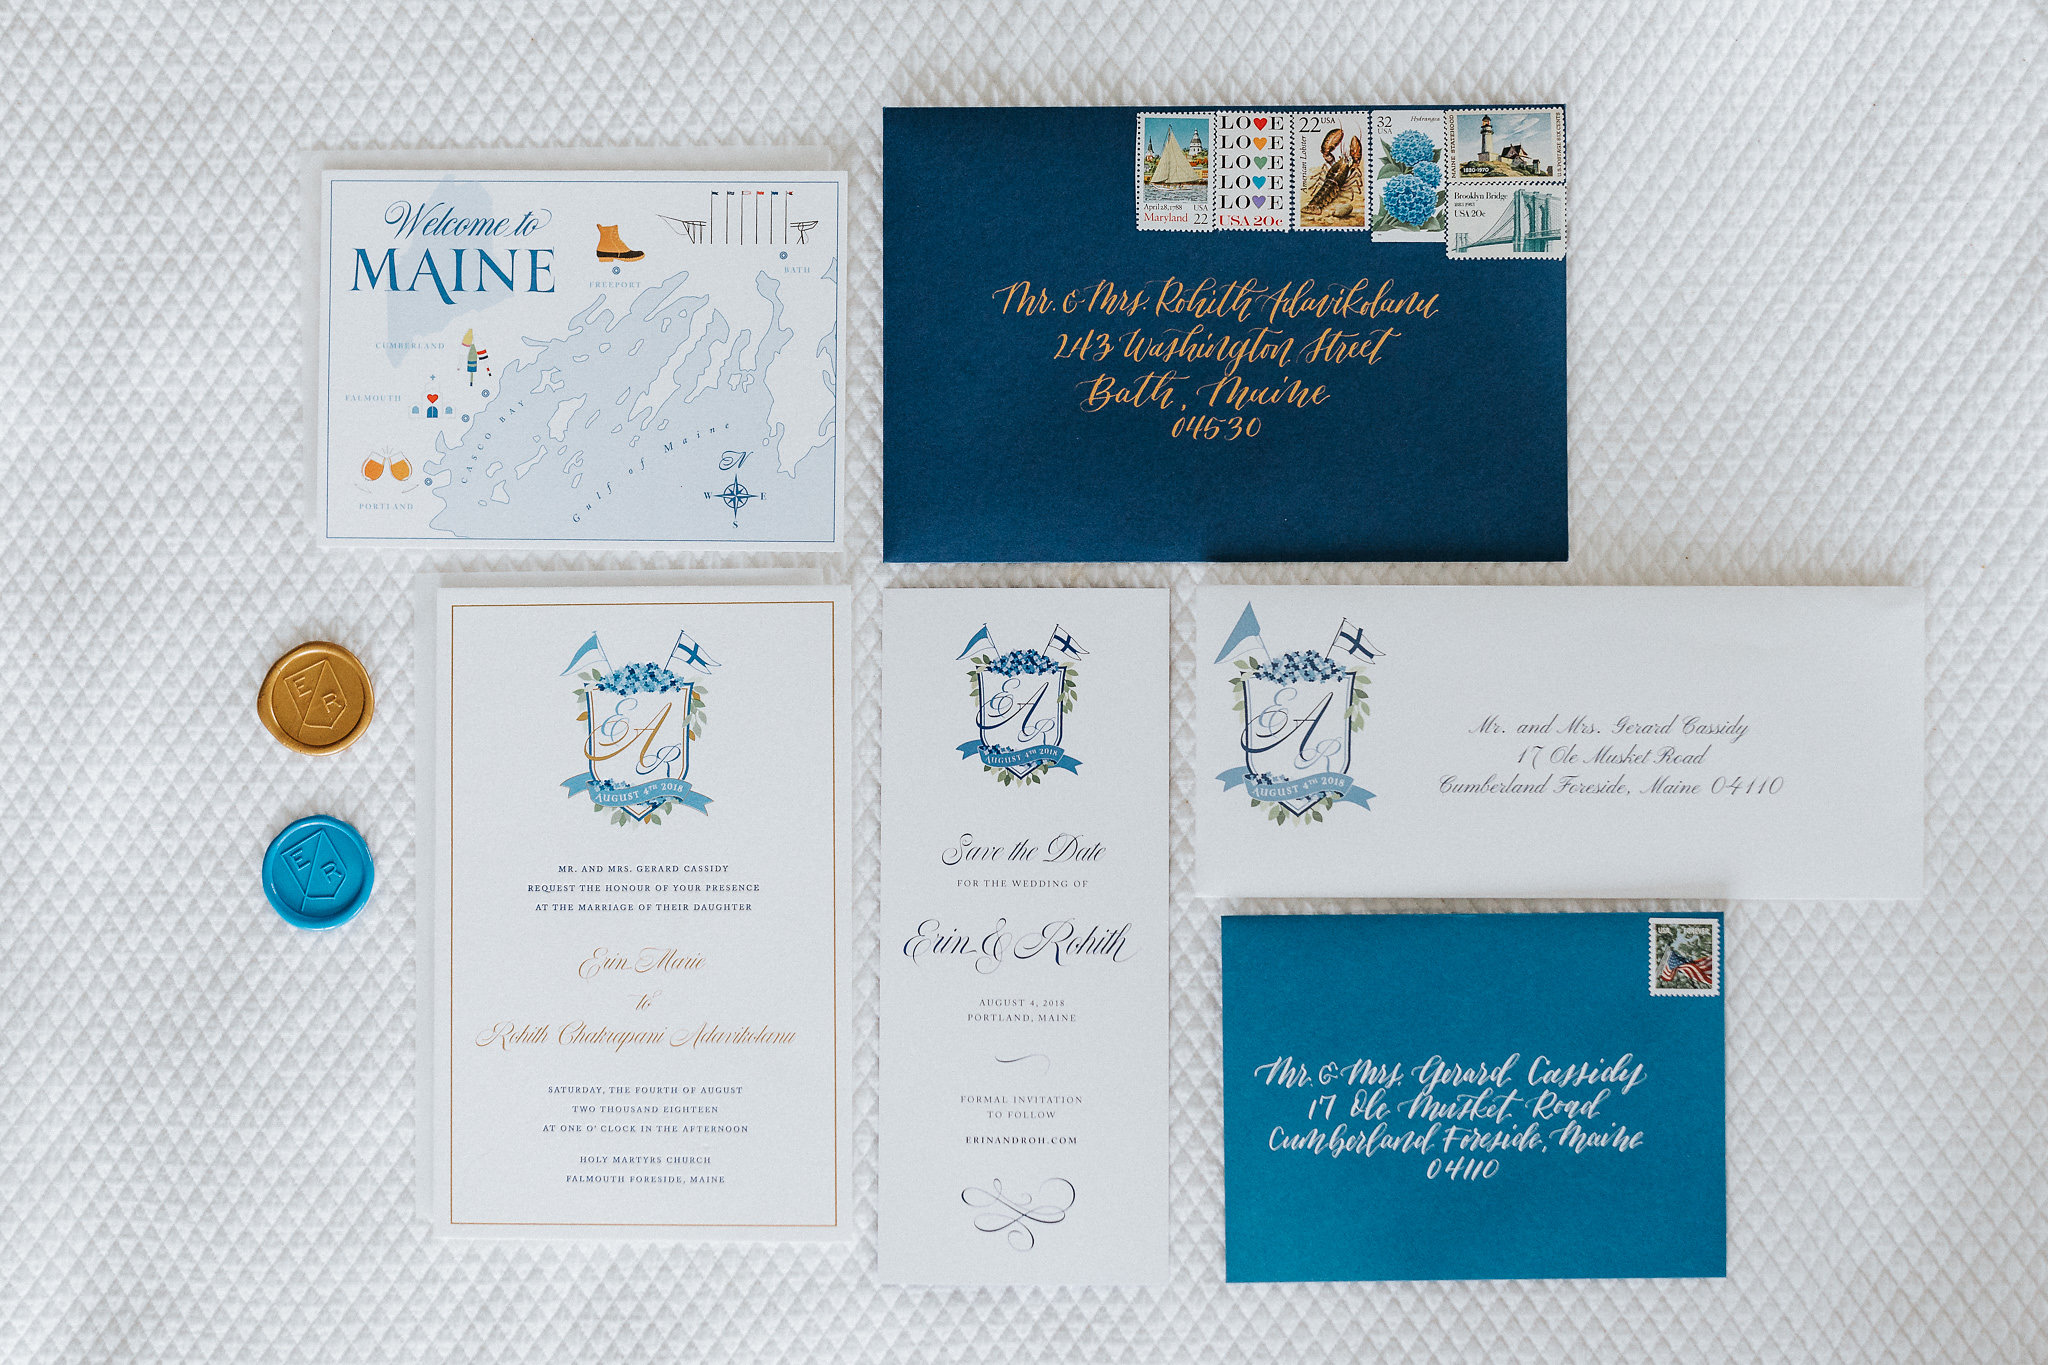 Maine Maritime Wedding_080418_3.jpg